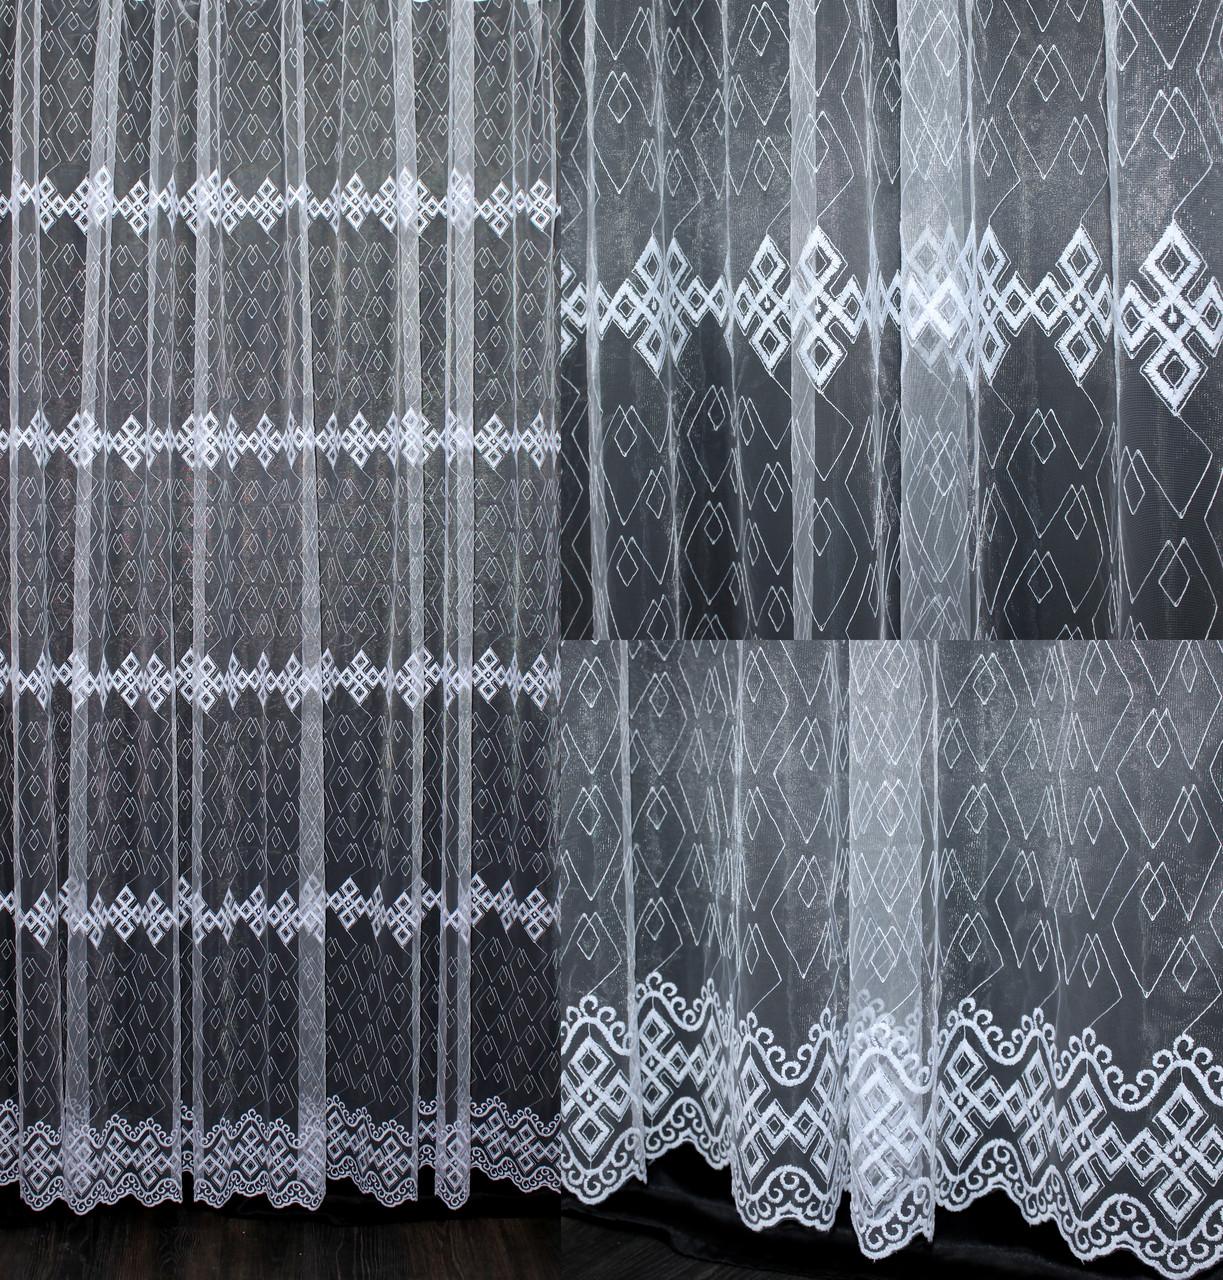 Гардина (3*2,5м) фатин с вышивкой. Цвет белый. Код 541т 40-221